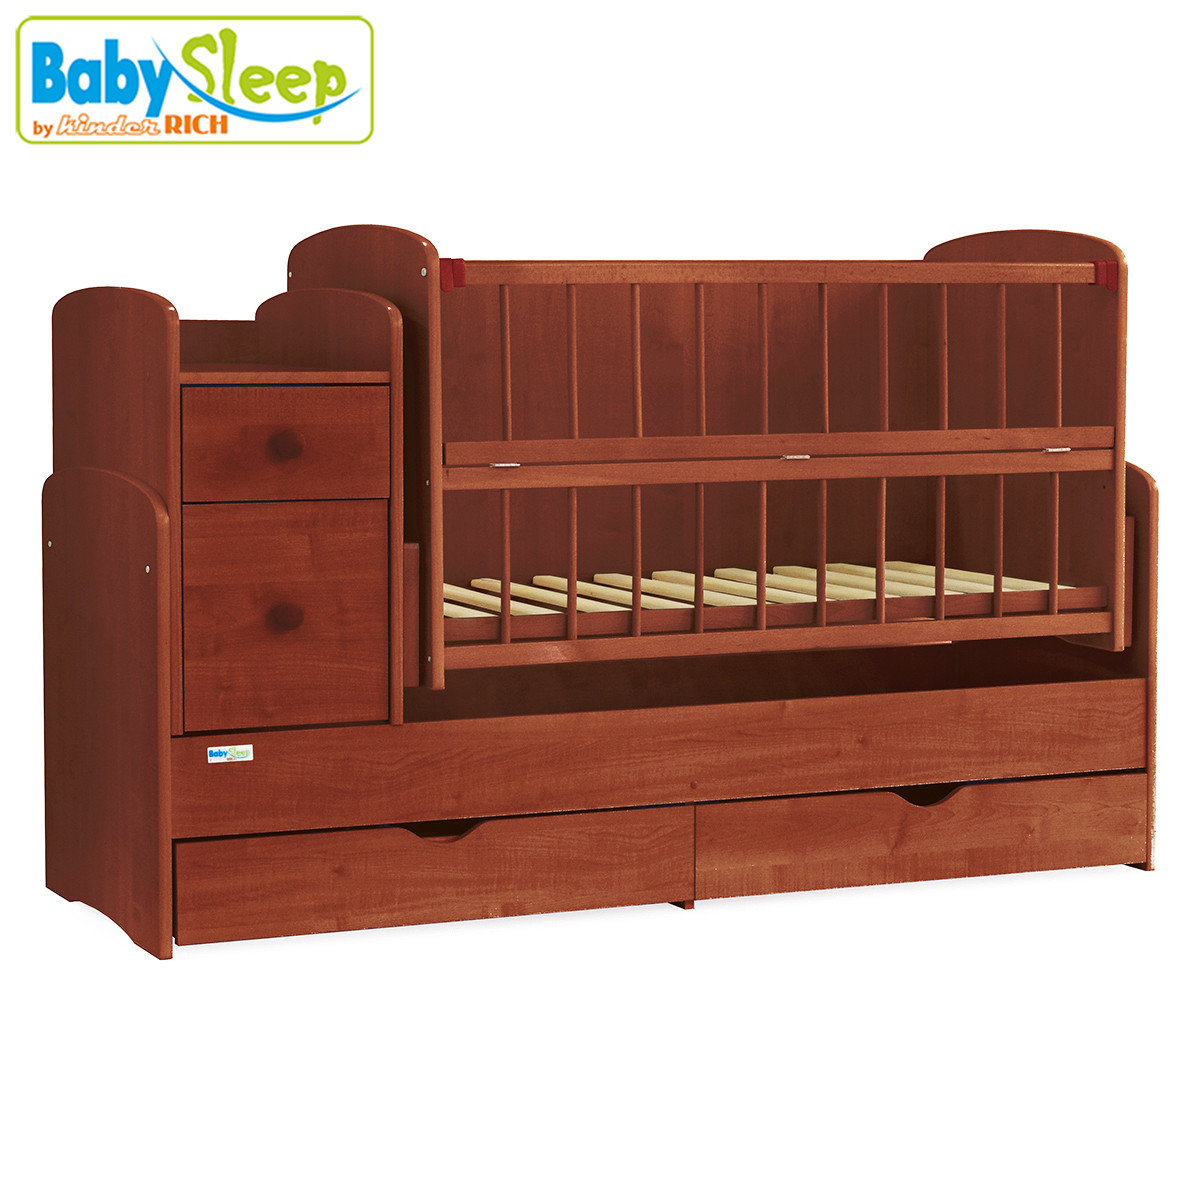 Ліжечко-трансформер Baby Sleep (Angela) DTP-S-B, Mahagoni